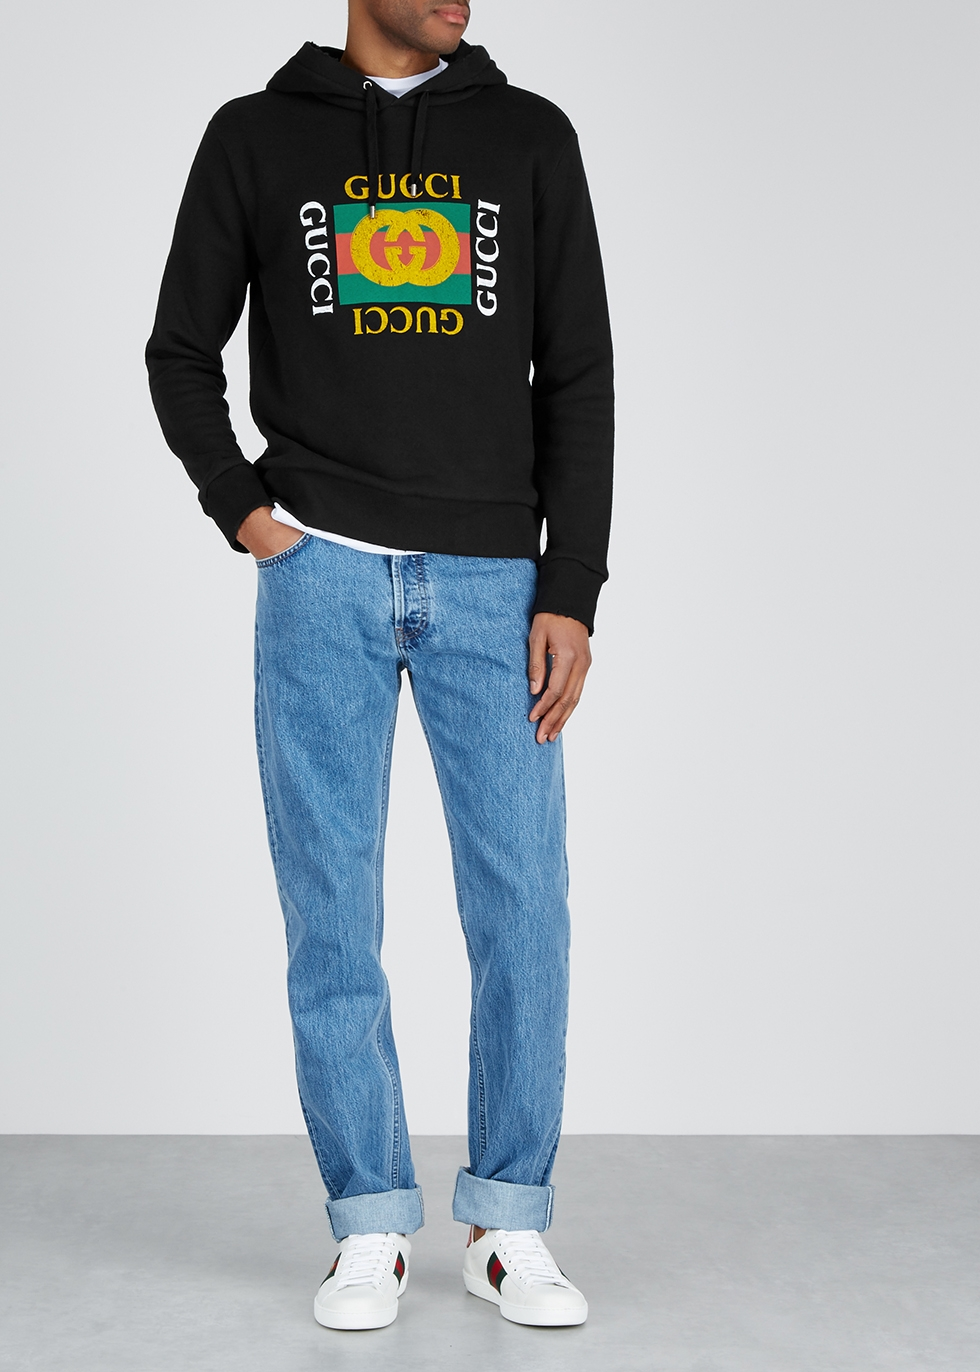 9dbce163ca4 Gucci - Mens - Harvey Nichols